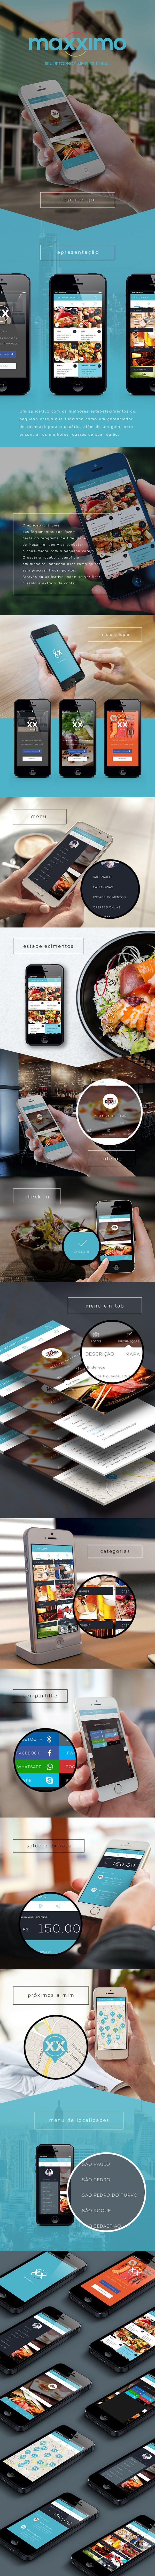 Maxximo Fidelidade App Redesign